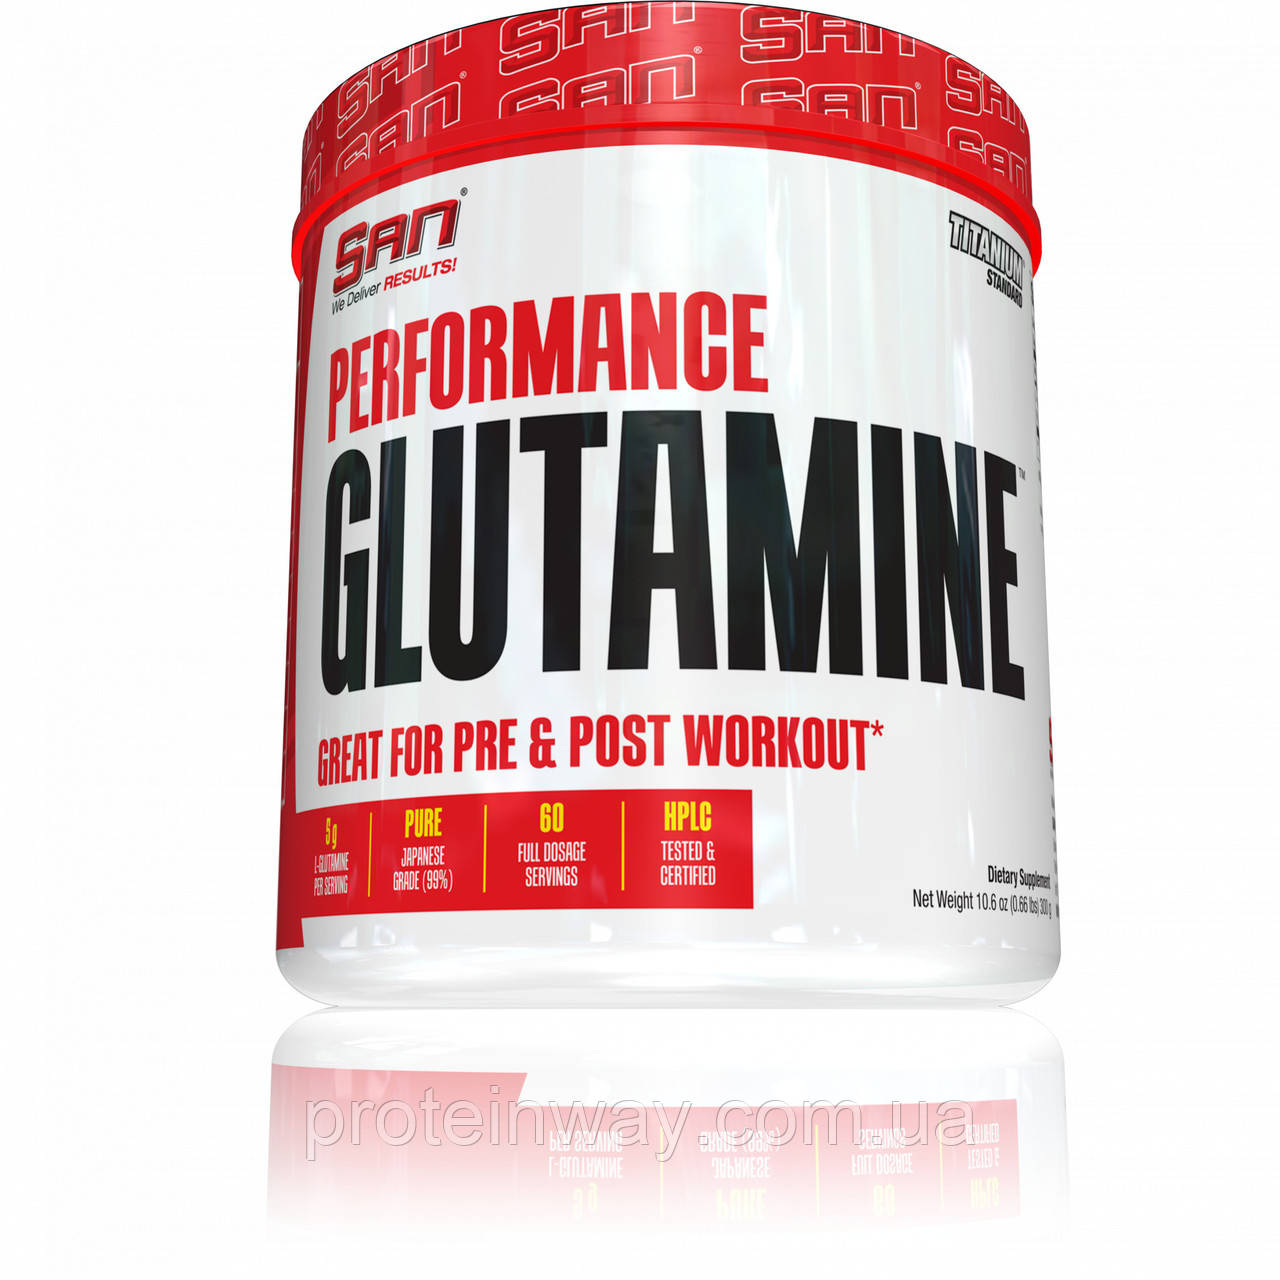 San Глютамин Performance Glutamine 1200 г